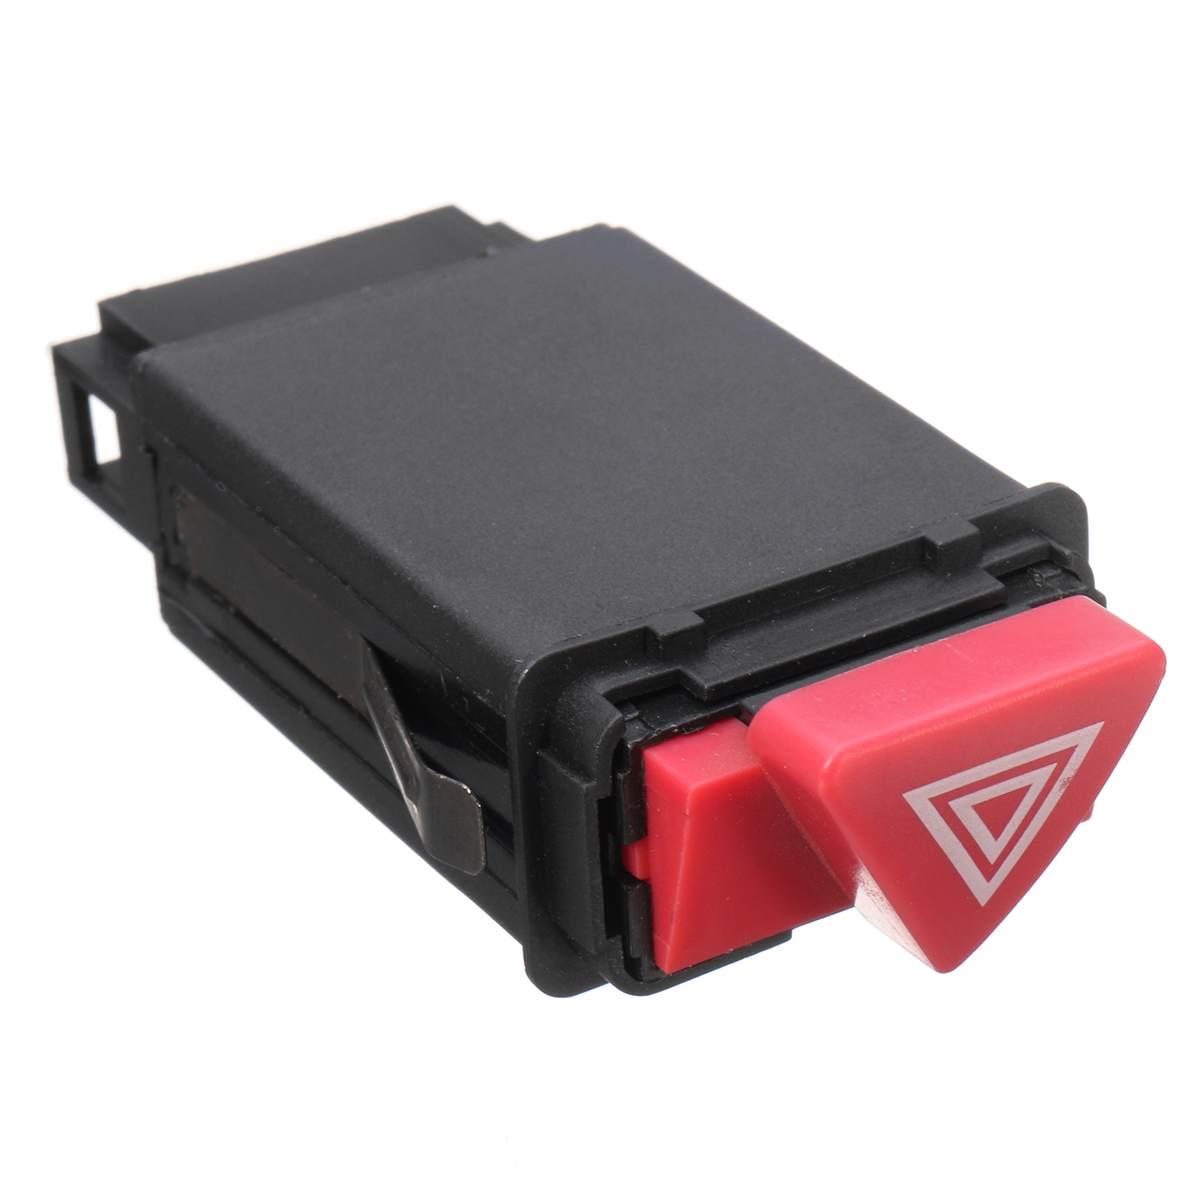 Luz indicadora de peligro de emergencia para coche, interruptor rojo 8D0941509H 8D0 941 509 H para Audi A3 A4 A6 C5 Allroad